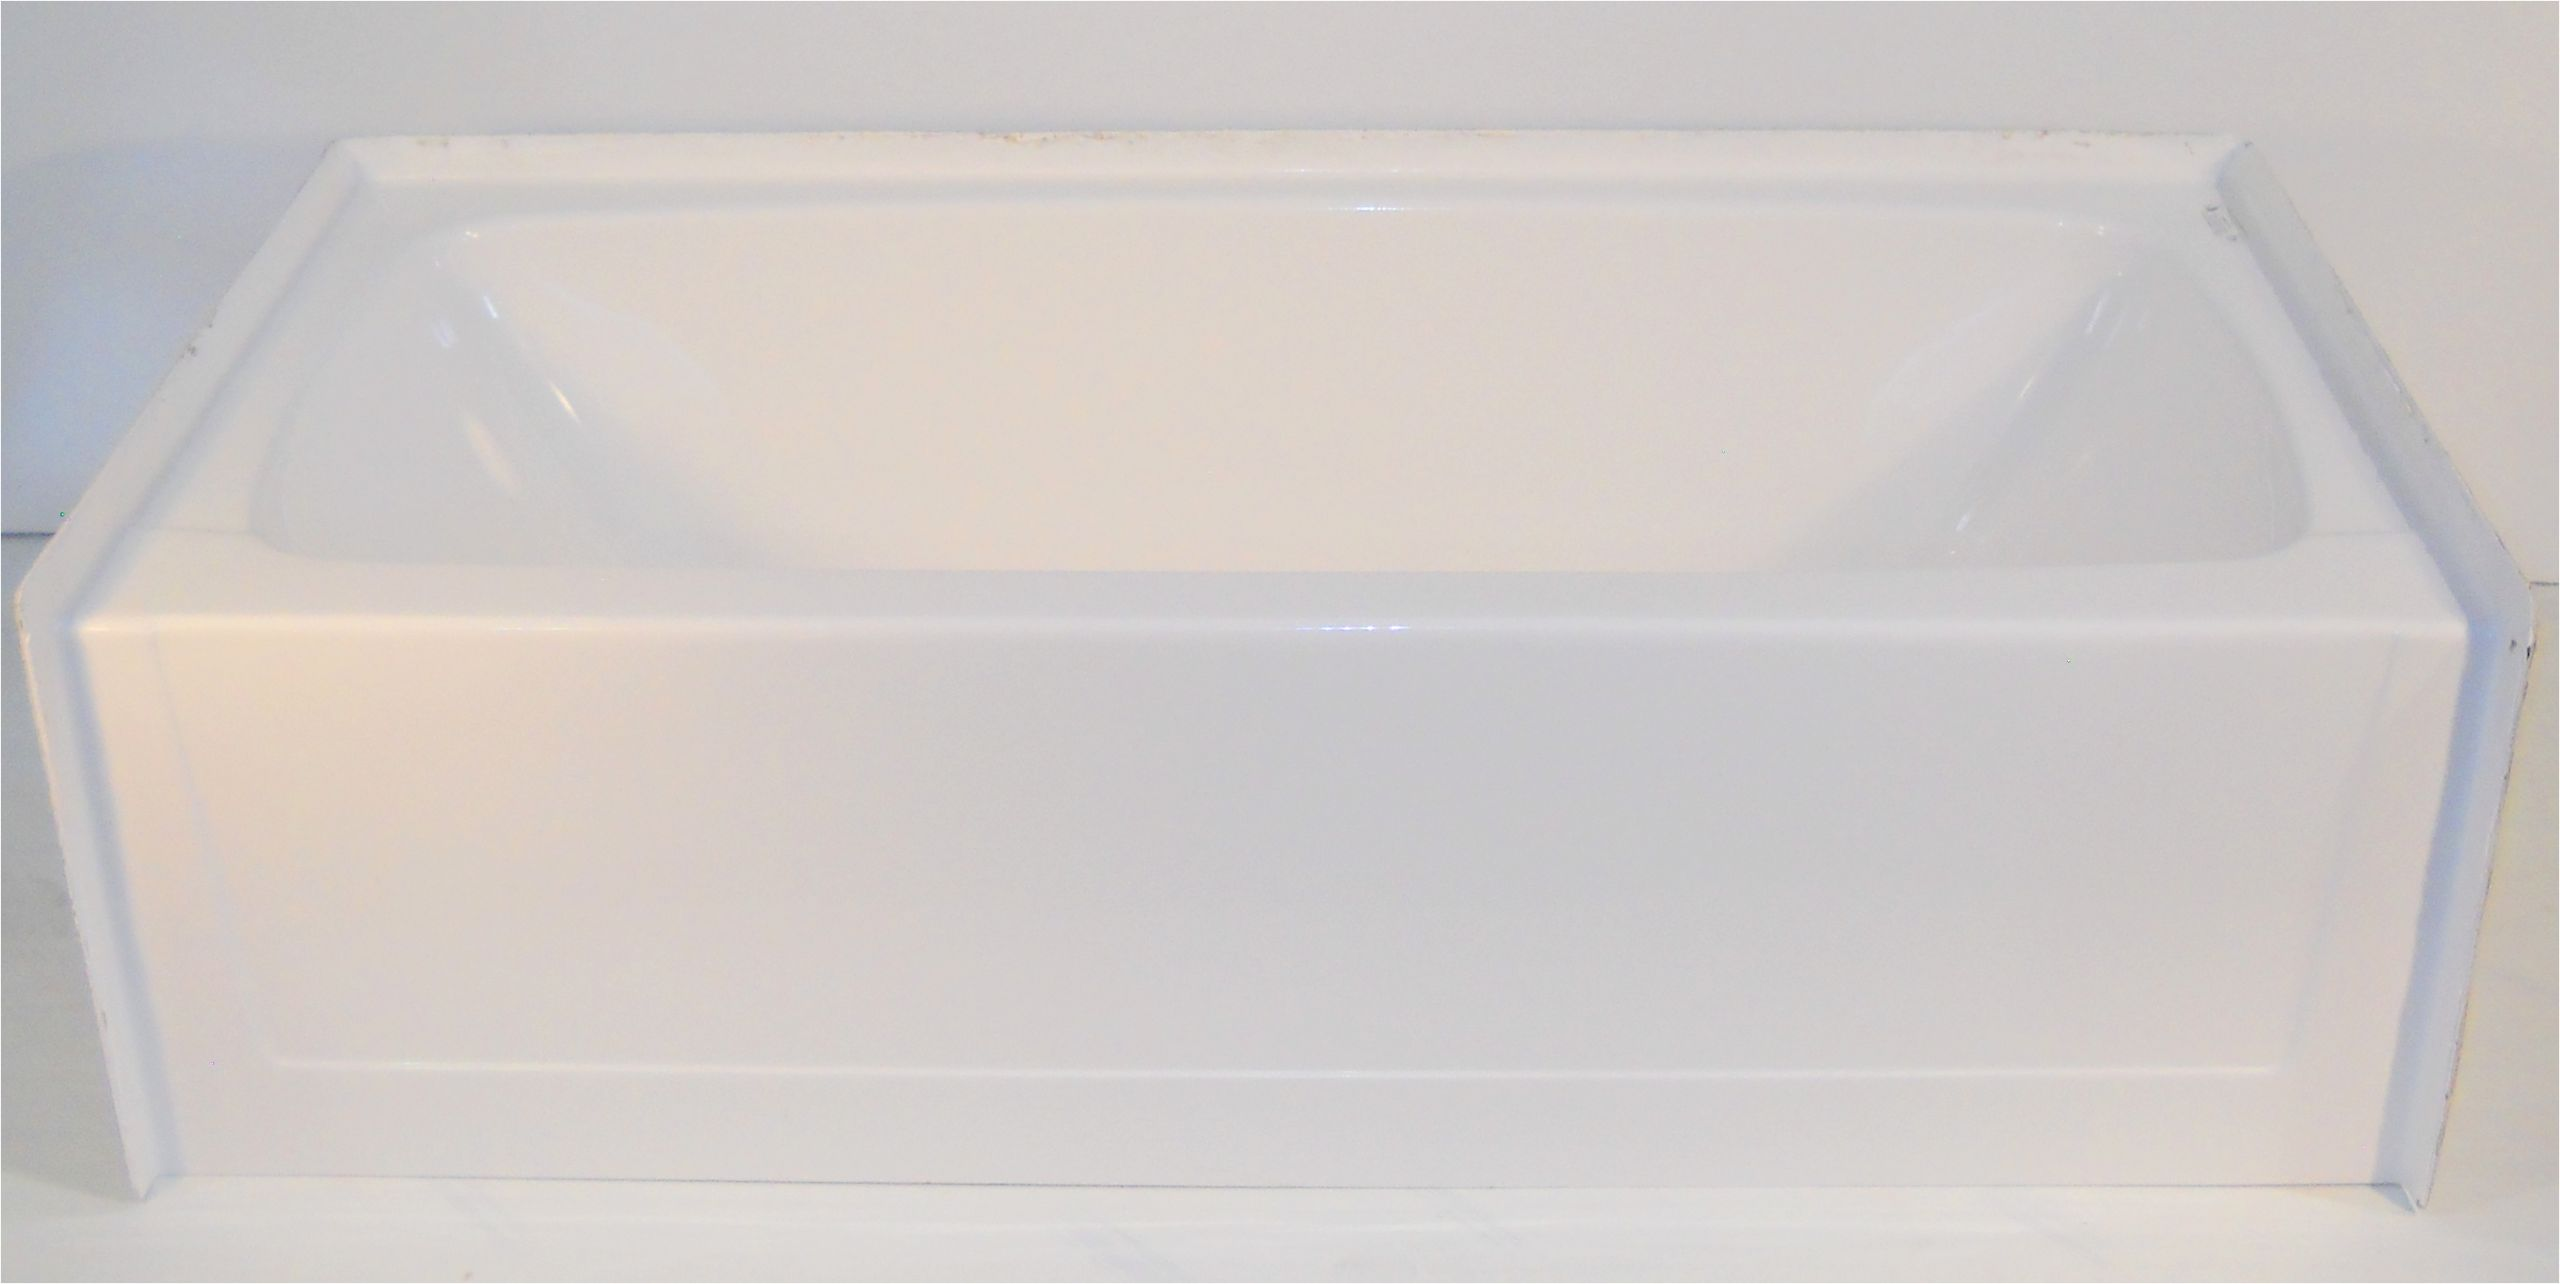 27 in x 54 in fiberglass tubwhitelh